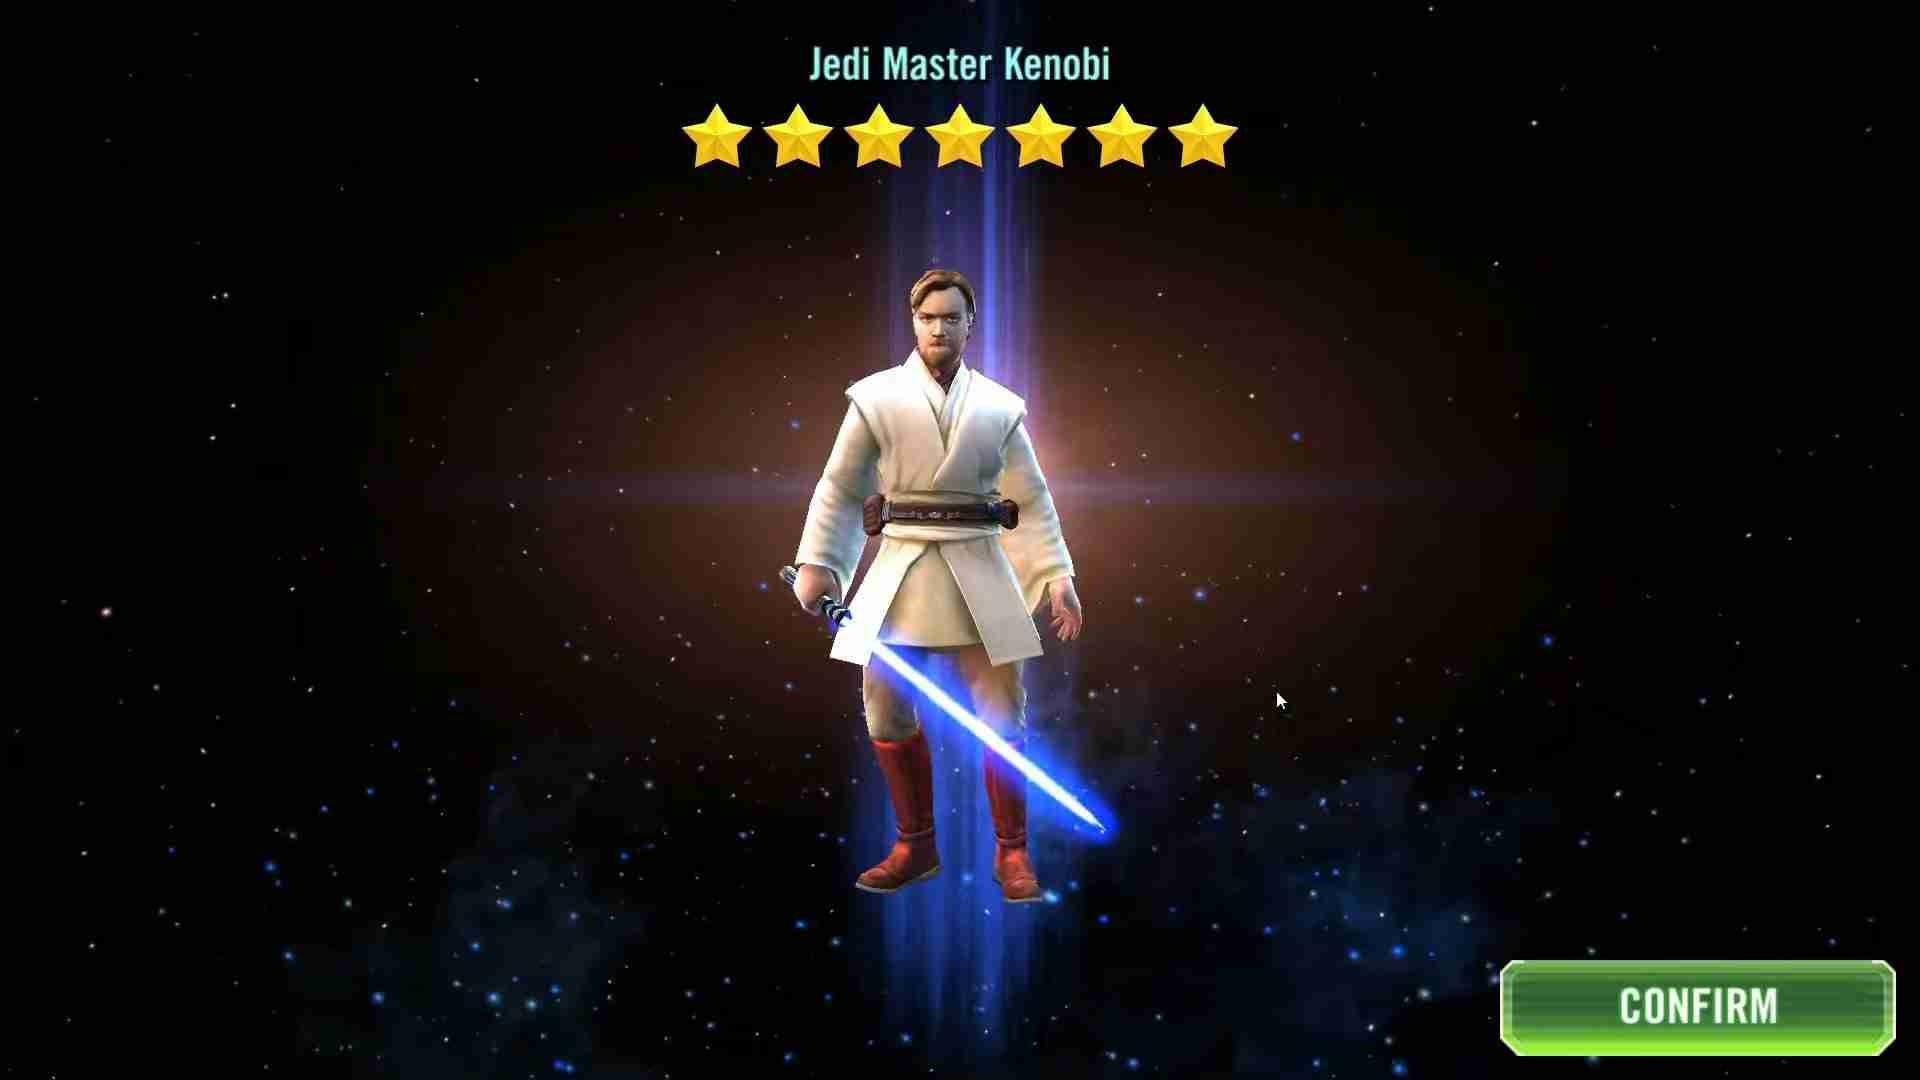 An Update on Jedi Master Kenobi in Galaxy of Heroes